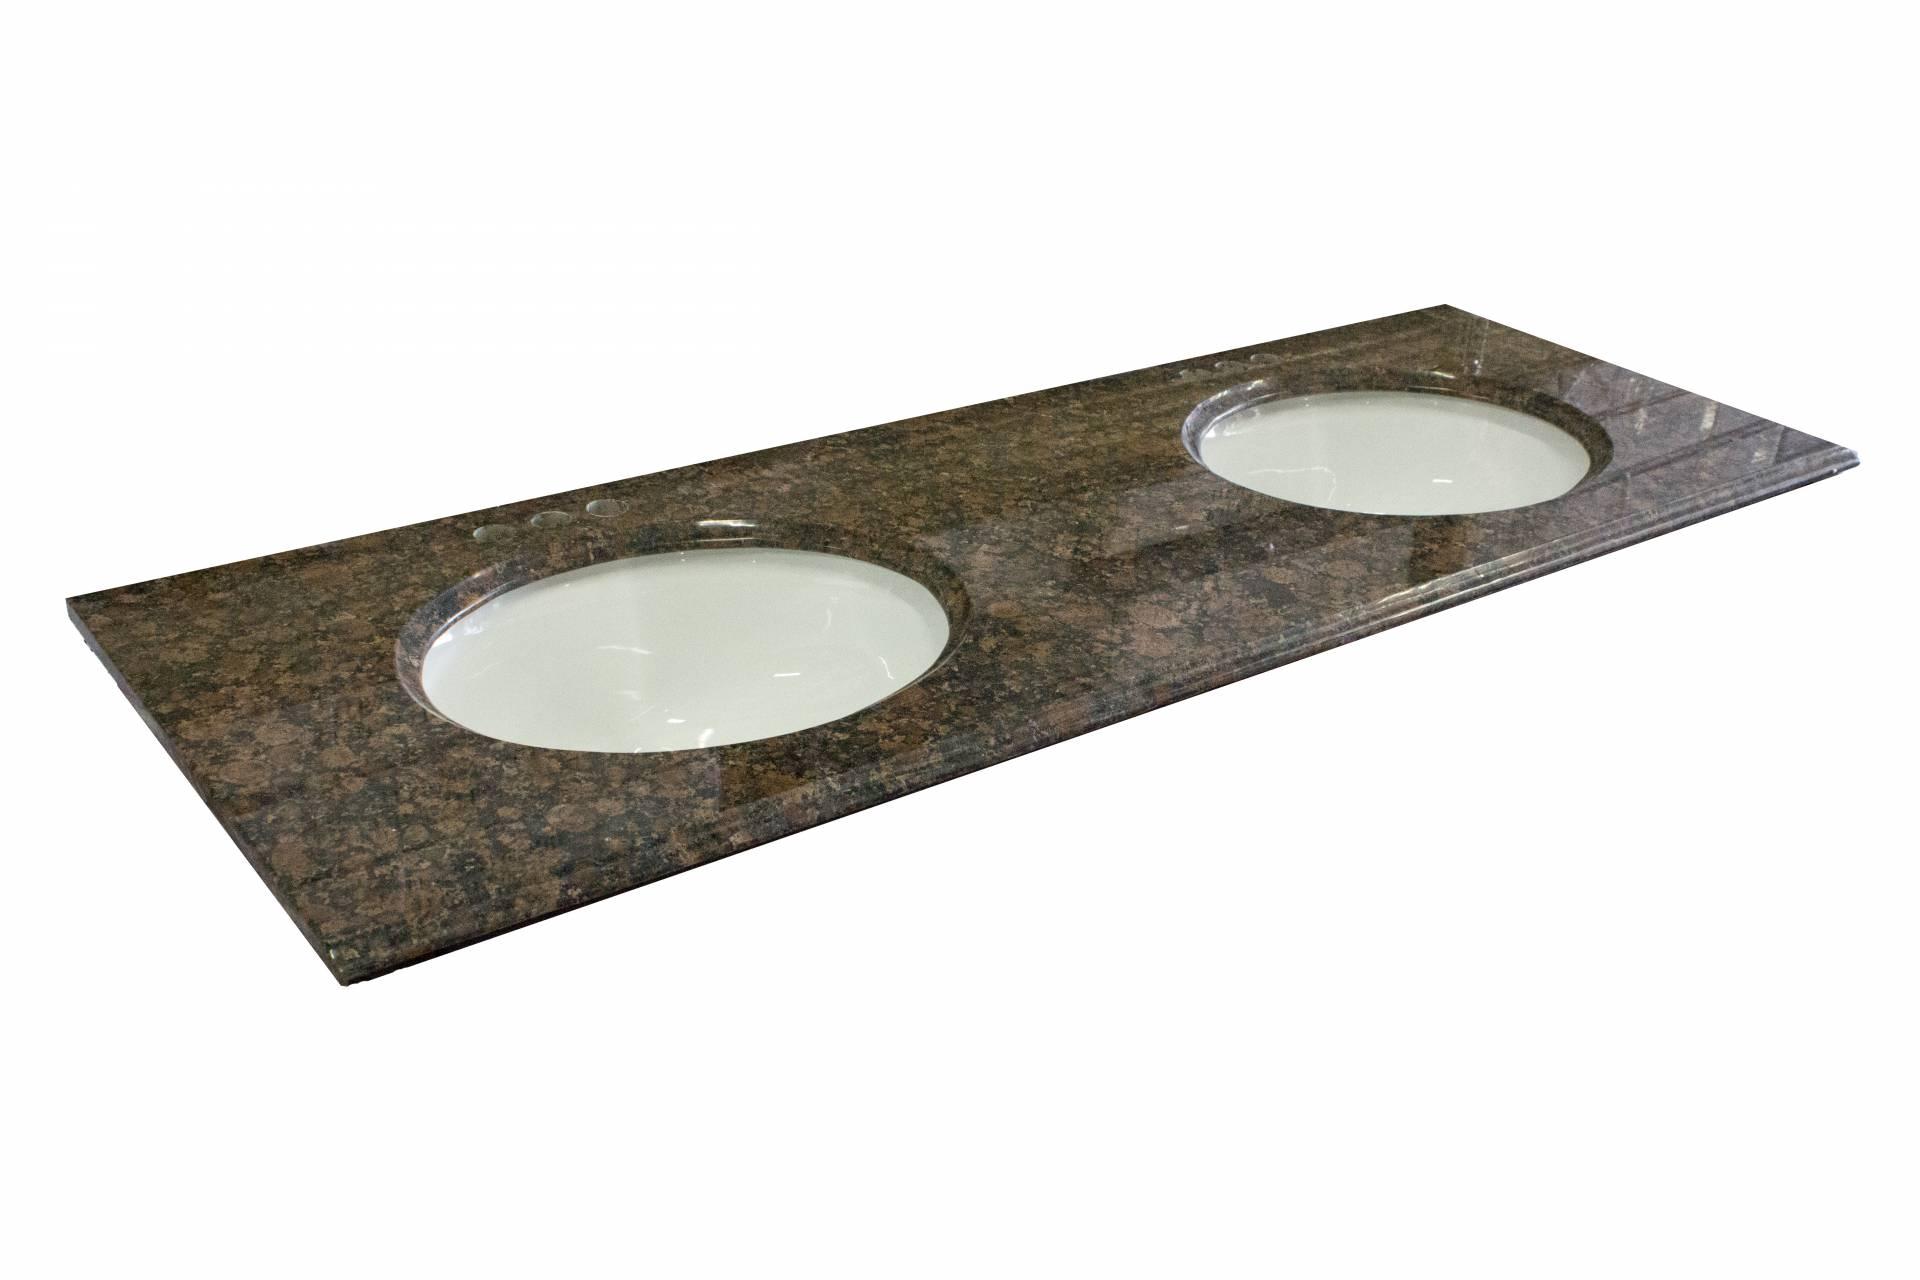 Granite Double Bowl Vanity Top : Double bowl granite vanity top quot baltic brown